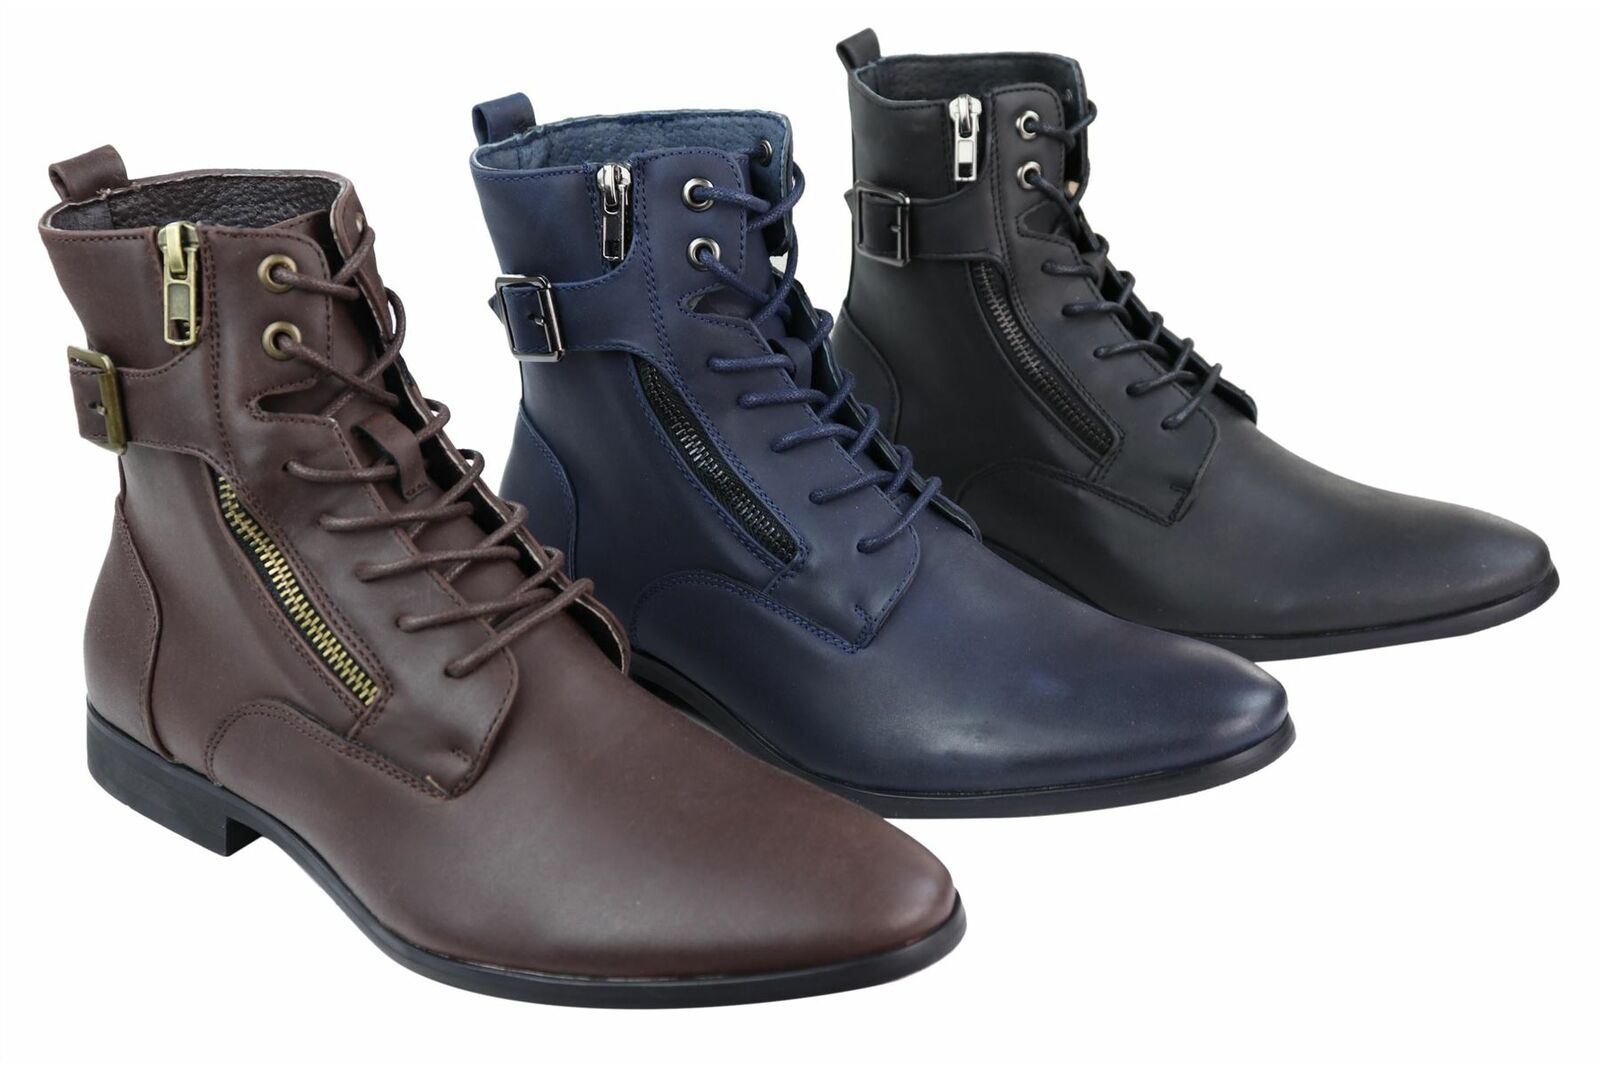 Mens Ankle Laced Zip Buckle Stiefel Military Vintage Peaky Blinders Smart Casual